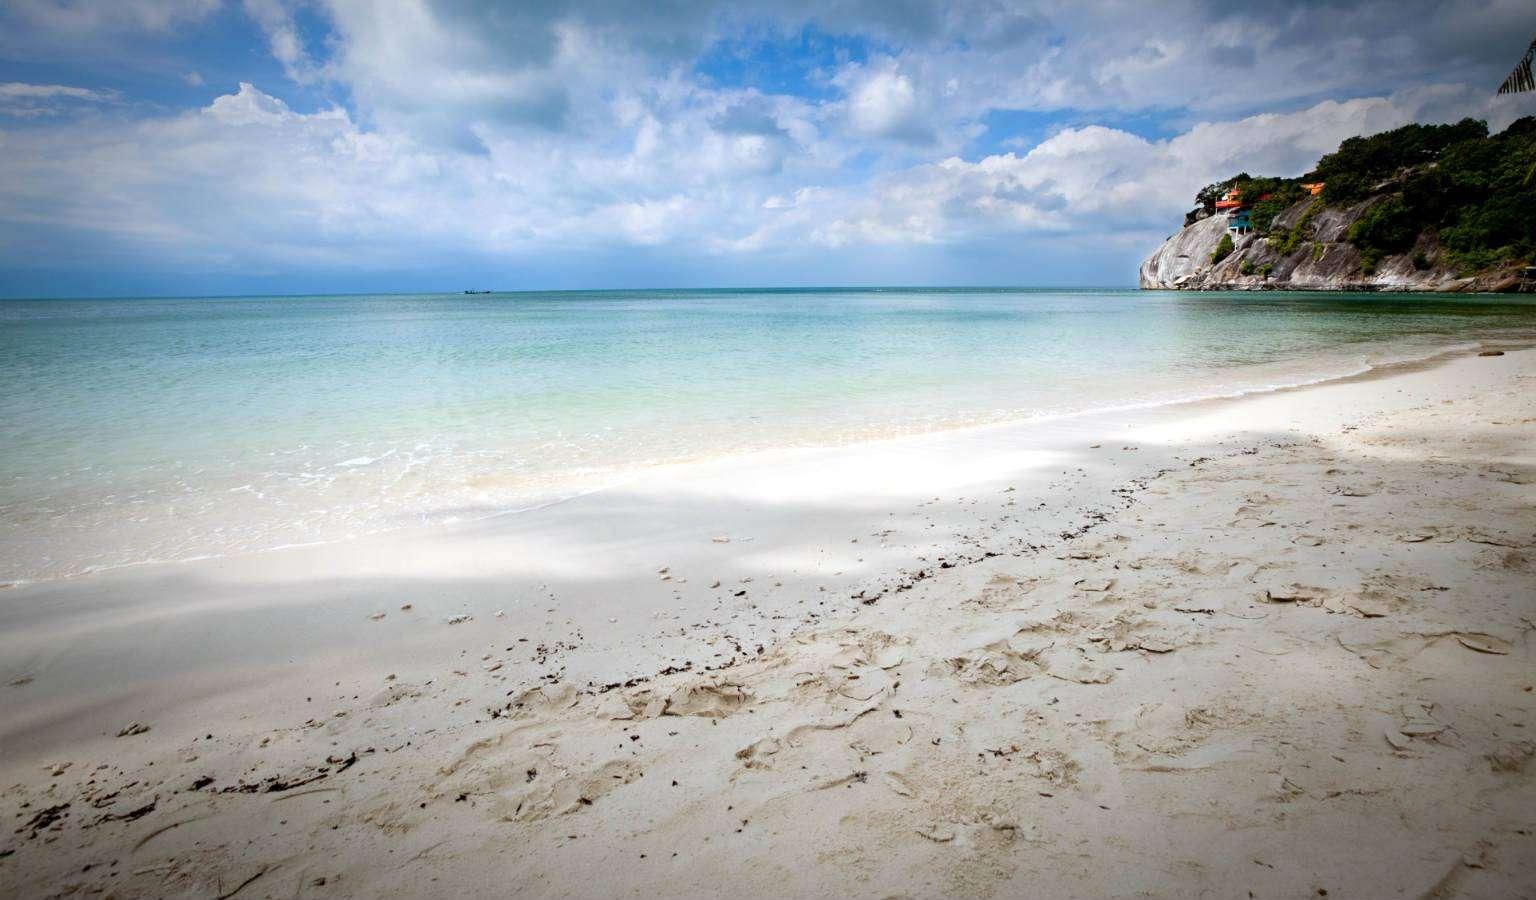 Het witte poerderzand van Leela Beach op Koh Phangan, Thailand